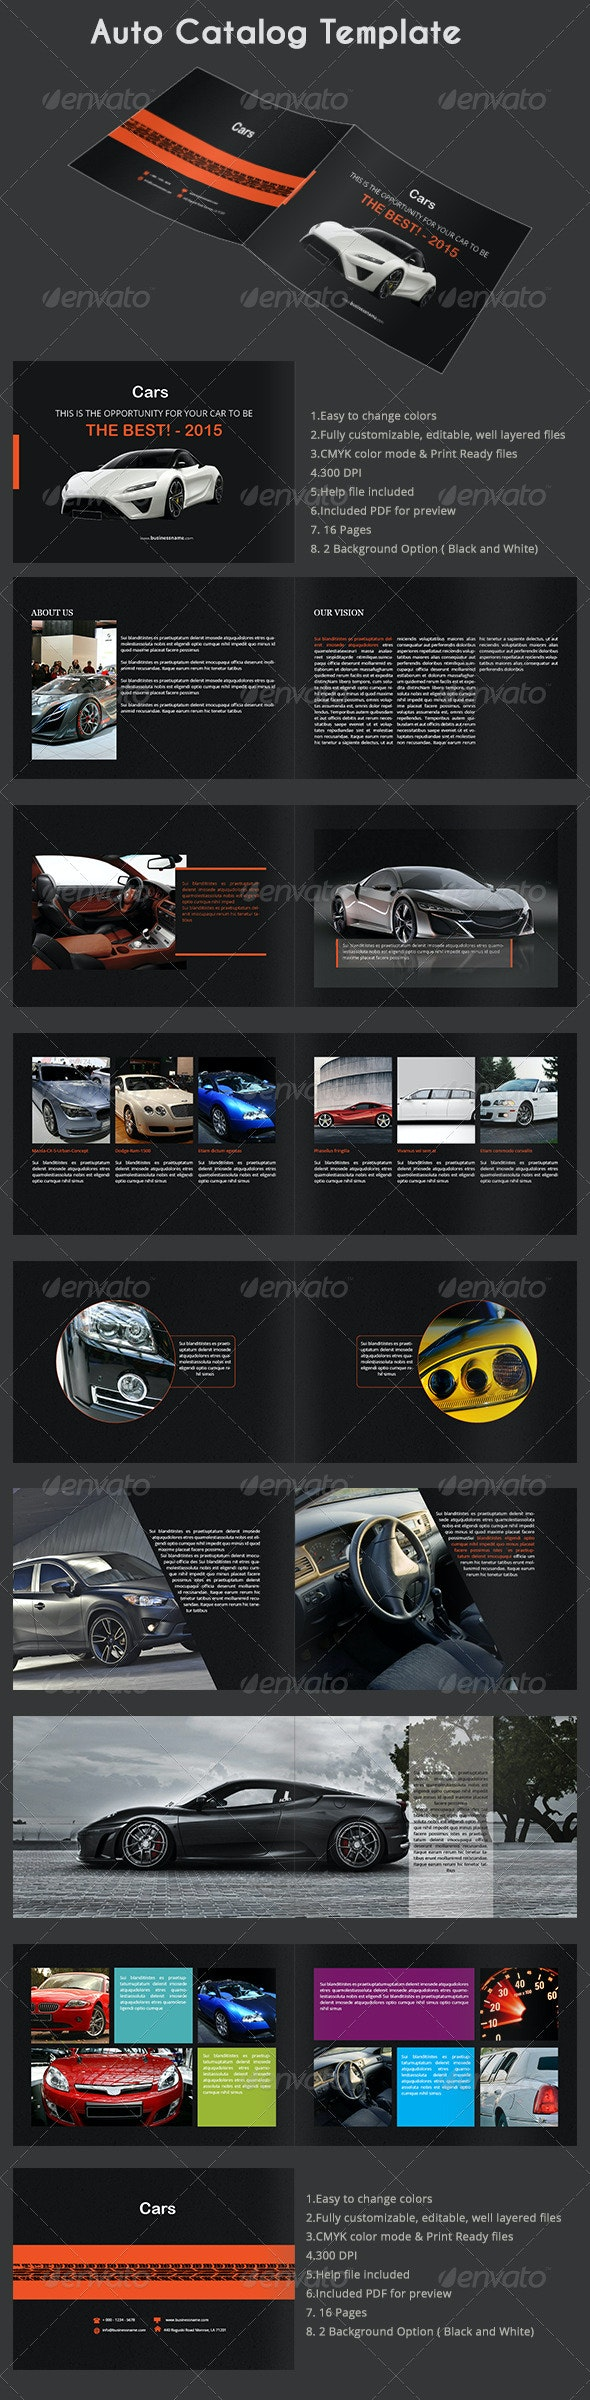 Auto Catalog Template - Catalogs Brochures